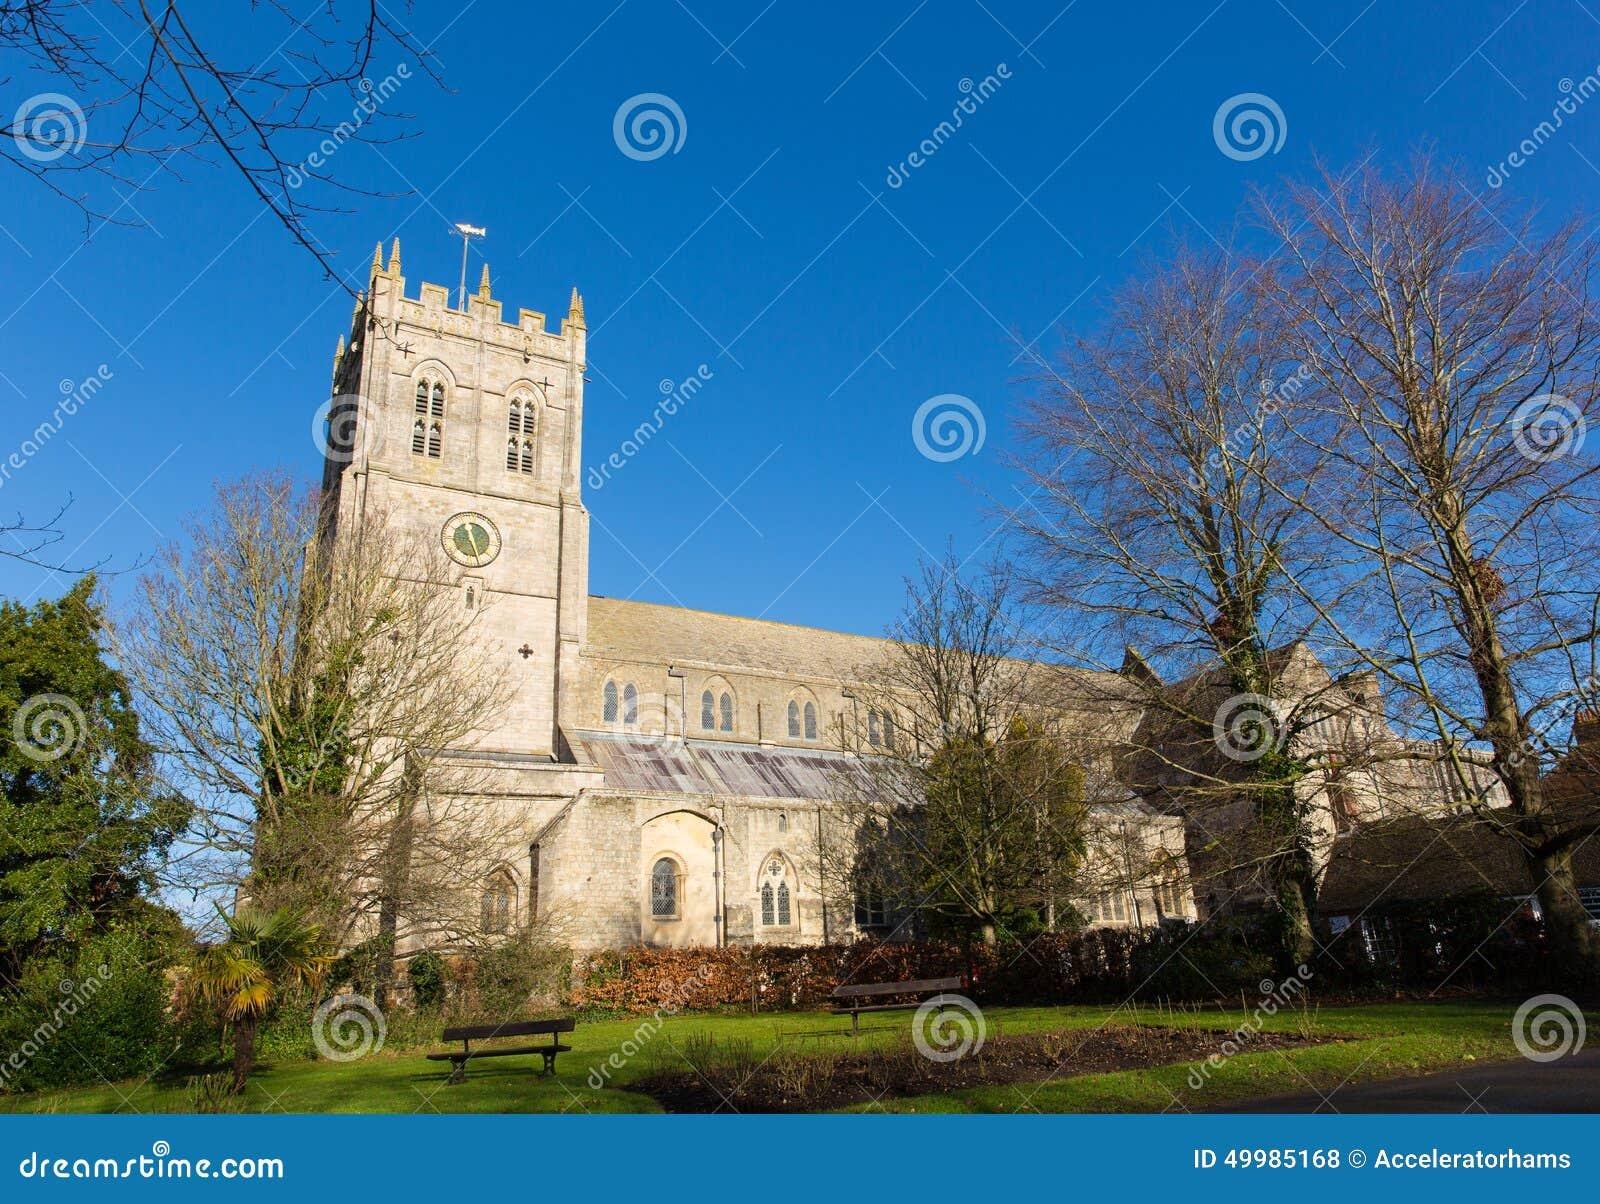 Christchurch Priory Dorset England UK 11th century Grade I listed church